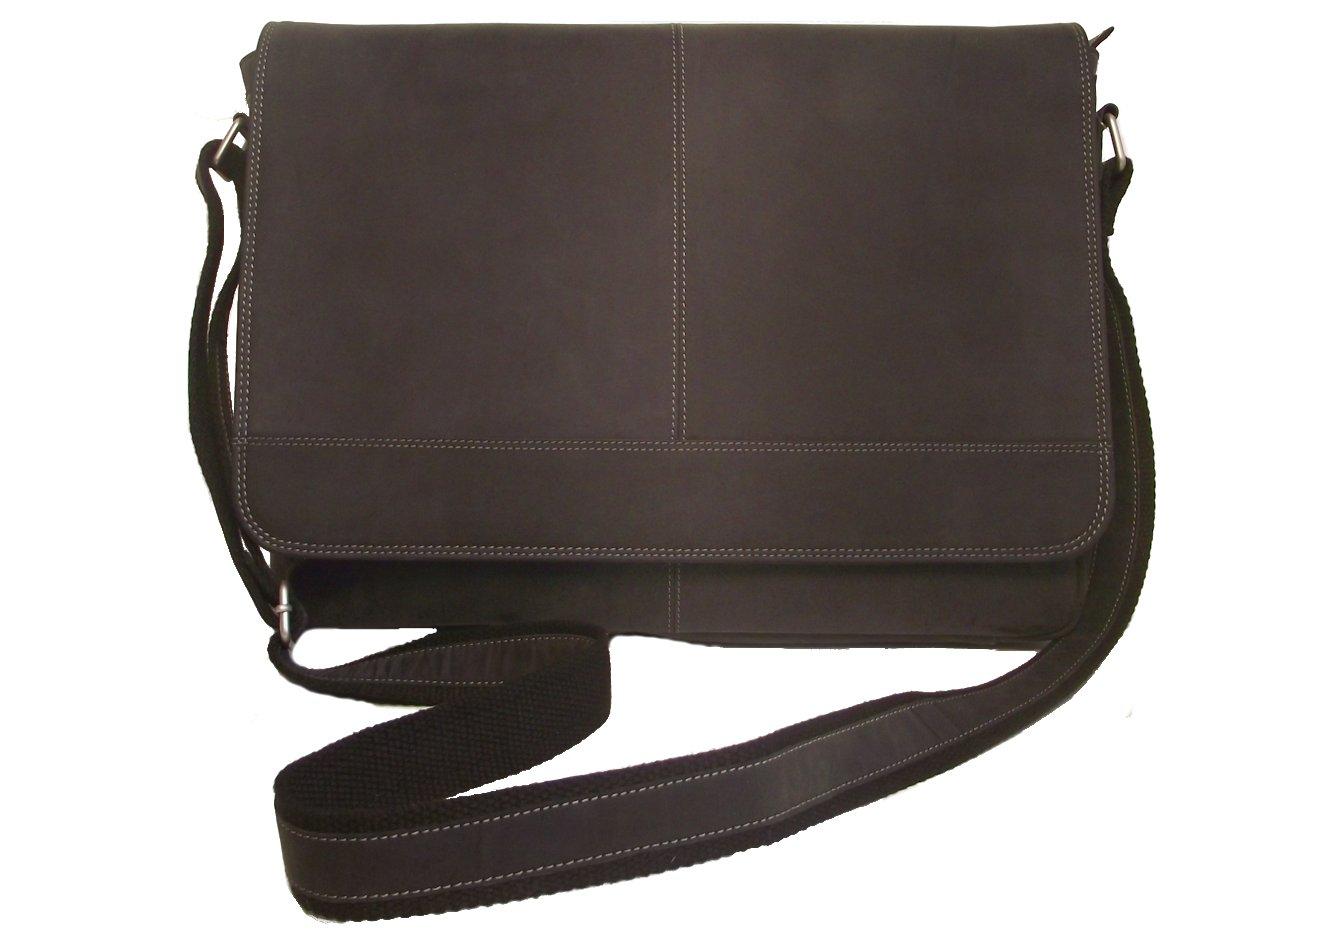 Kožená taška přes rameno KROL 2019